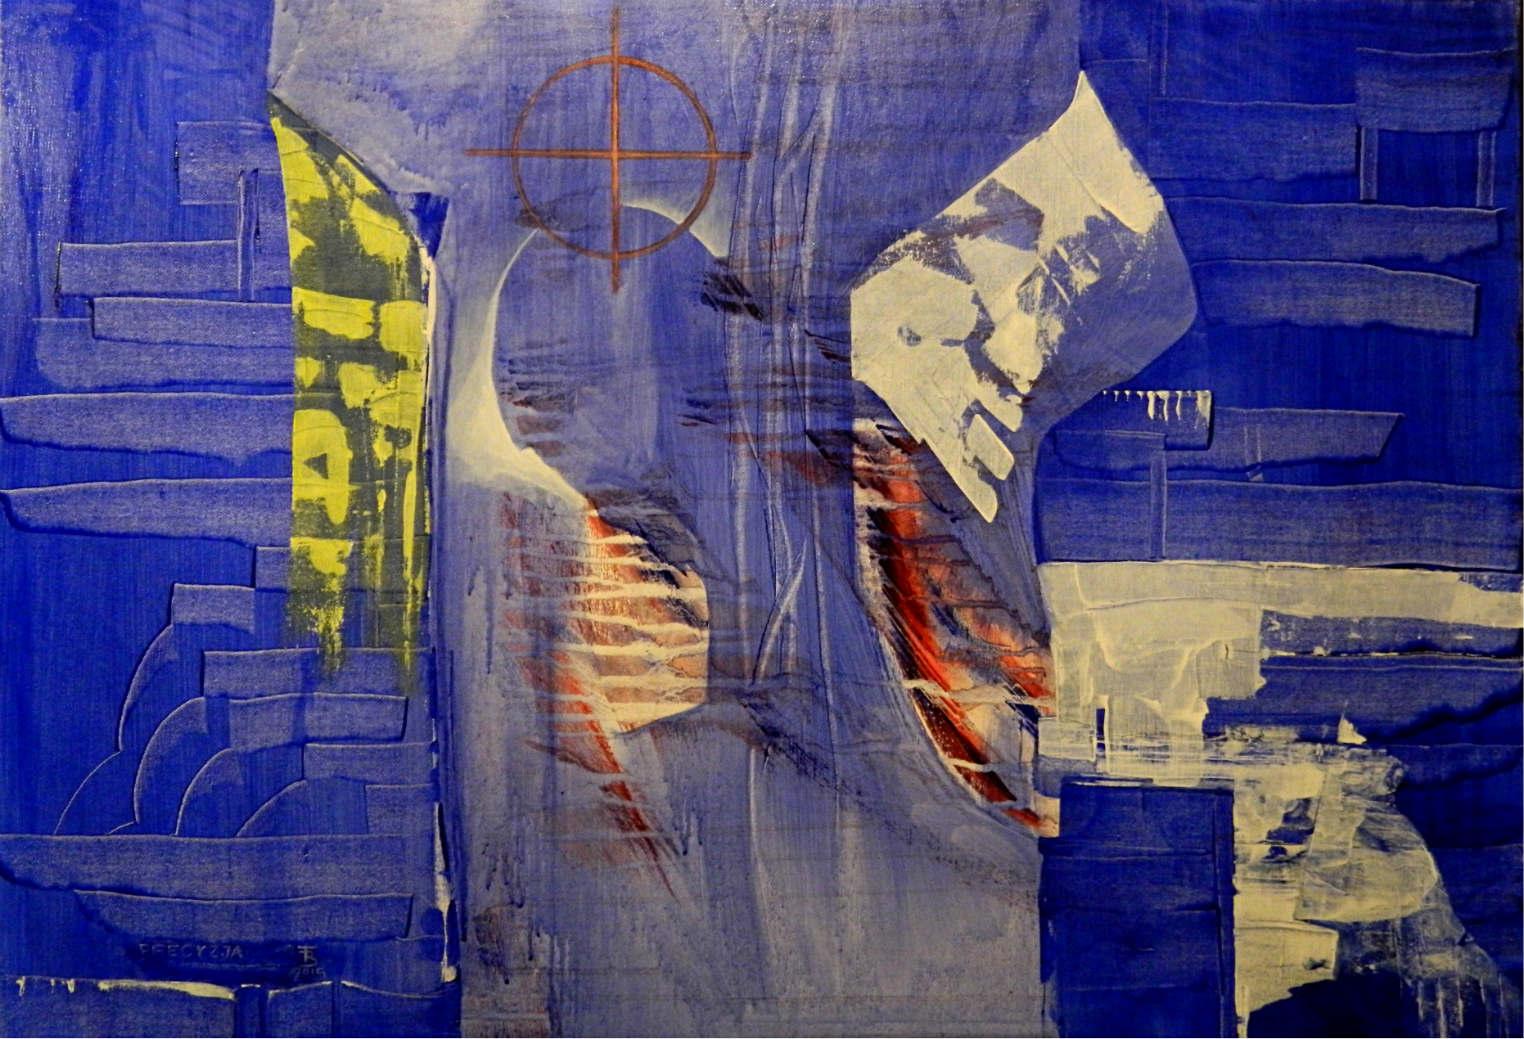 PRECYZJA akryl-płótno, 100 x 70 cm